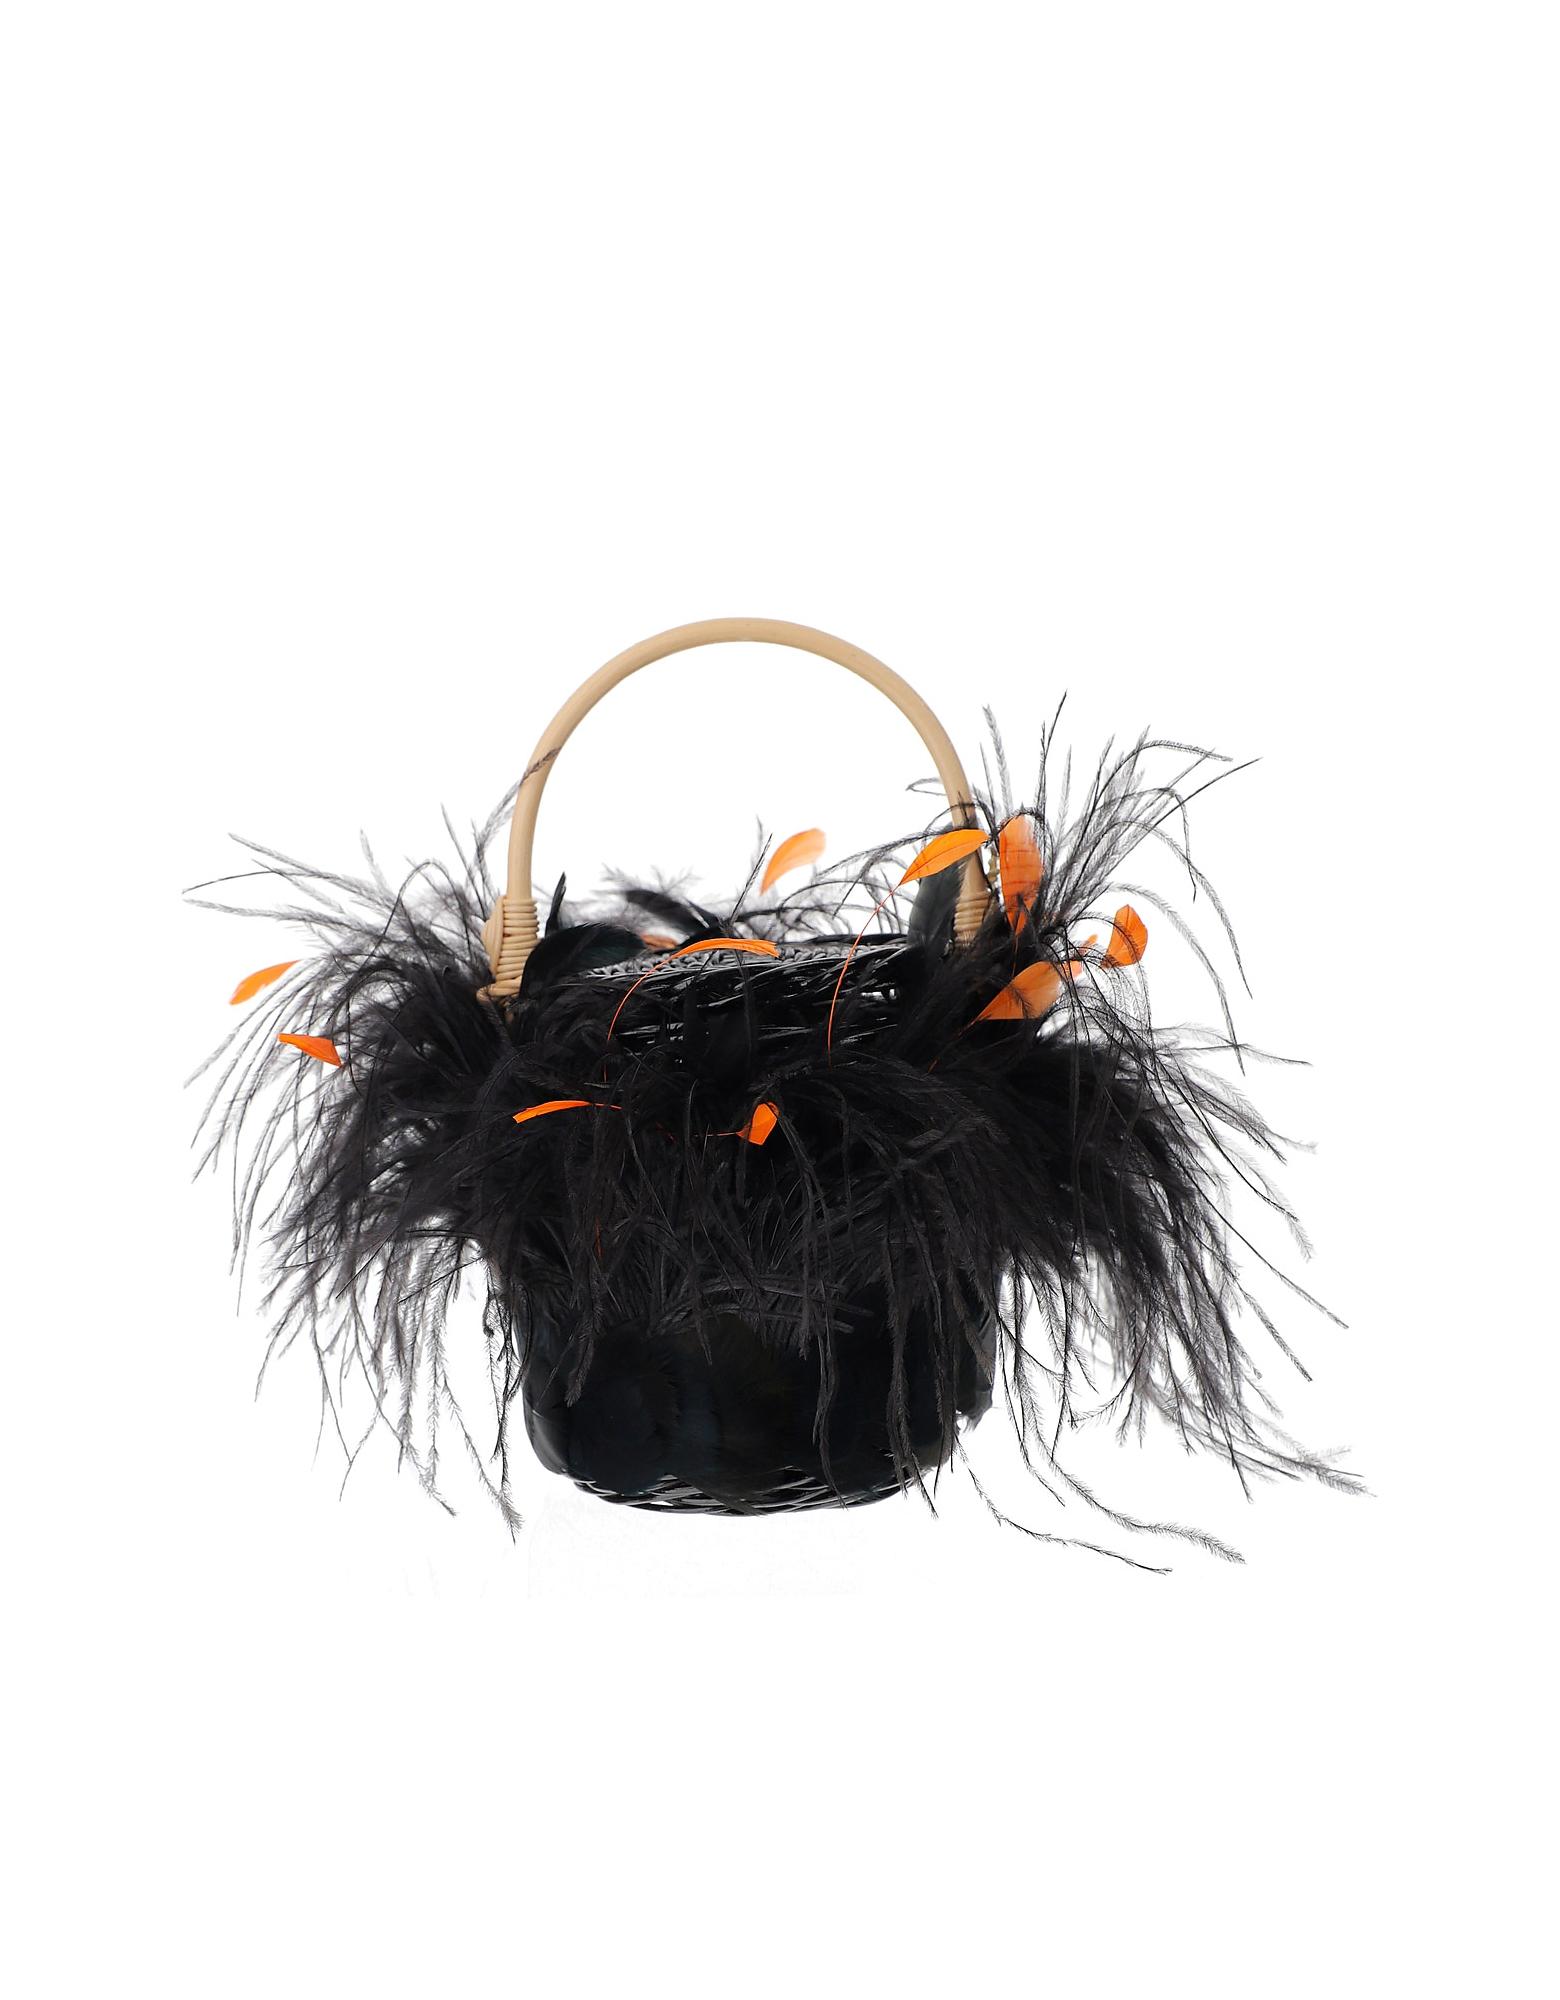 Gatti Designer Handbags, Black Feathers Tweety Bag